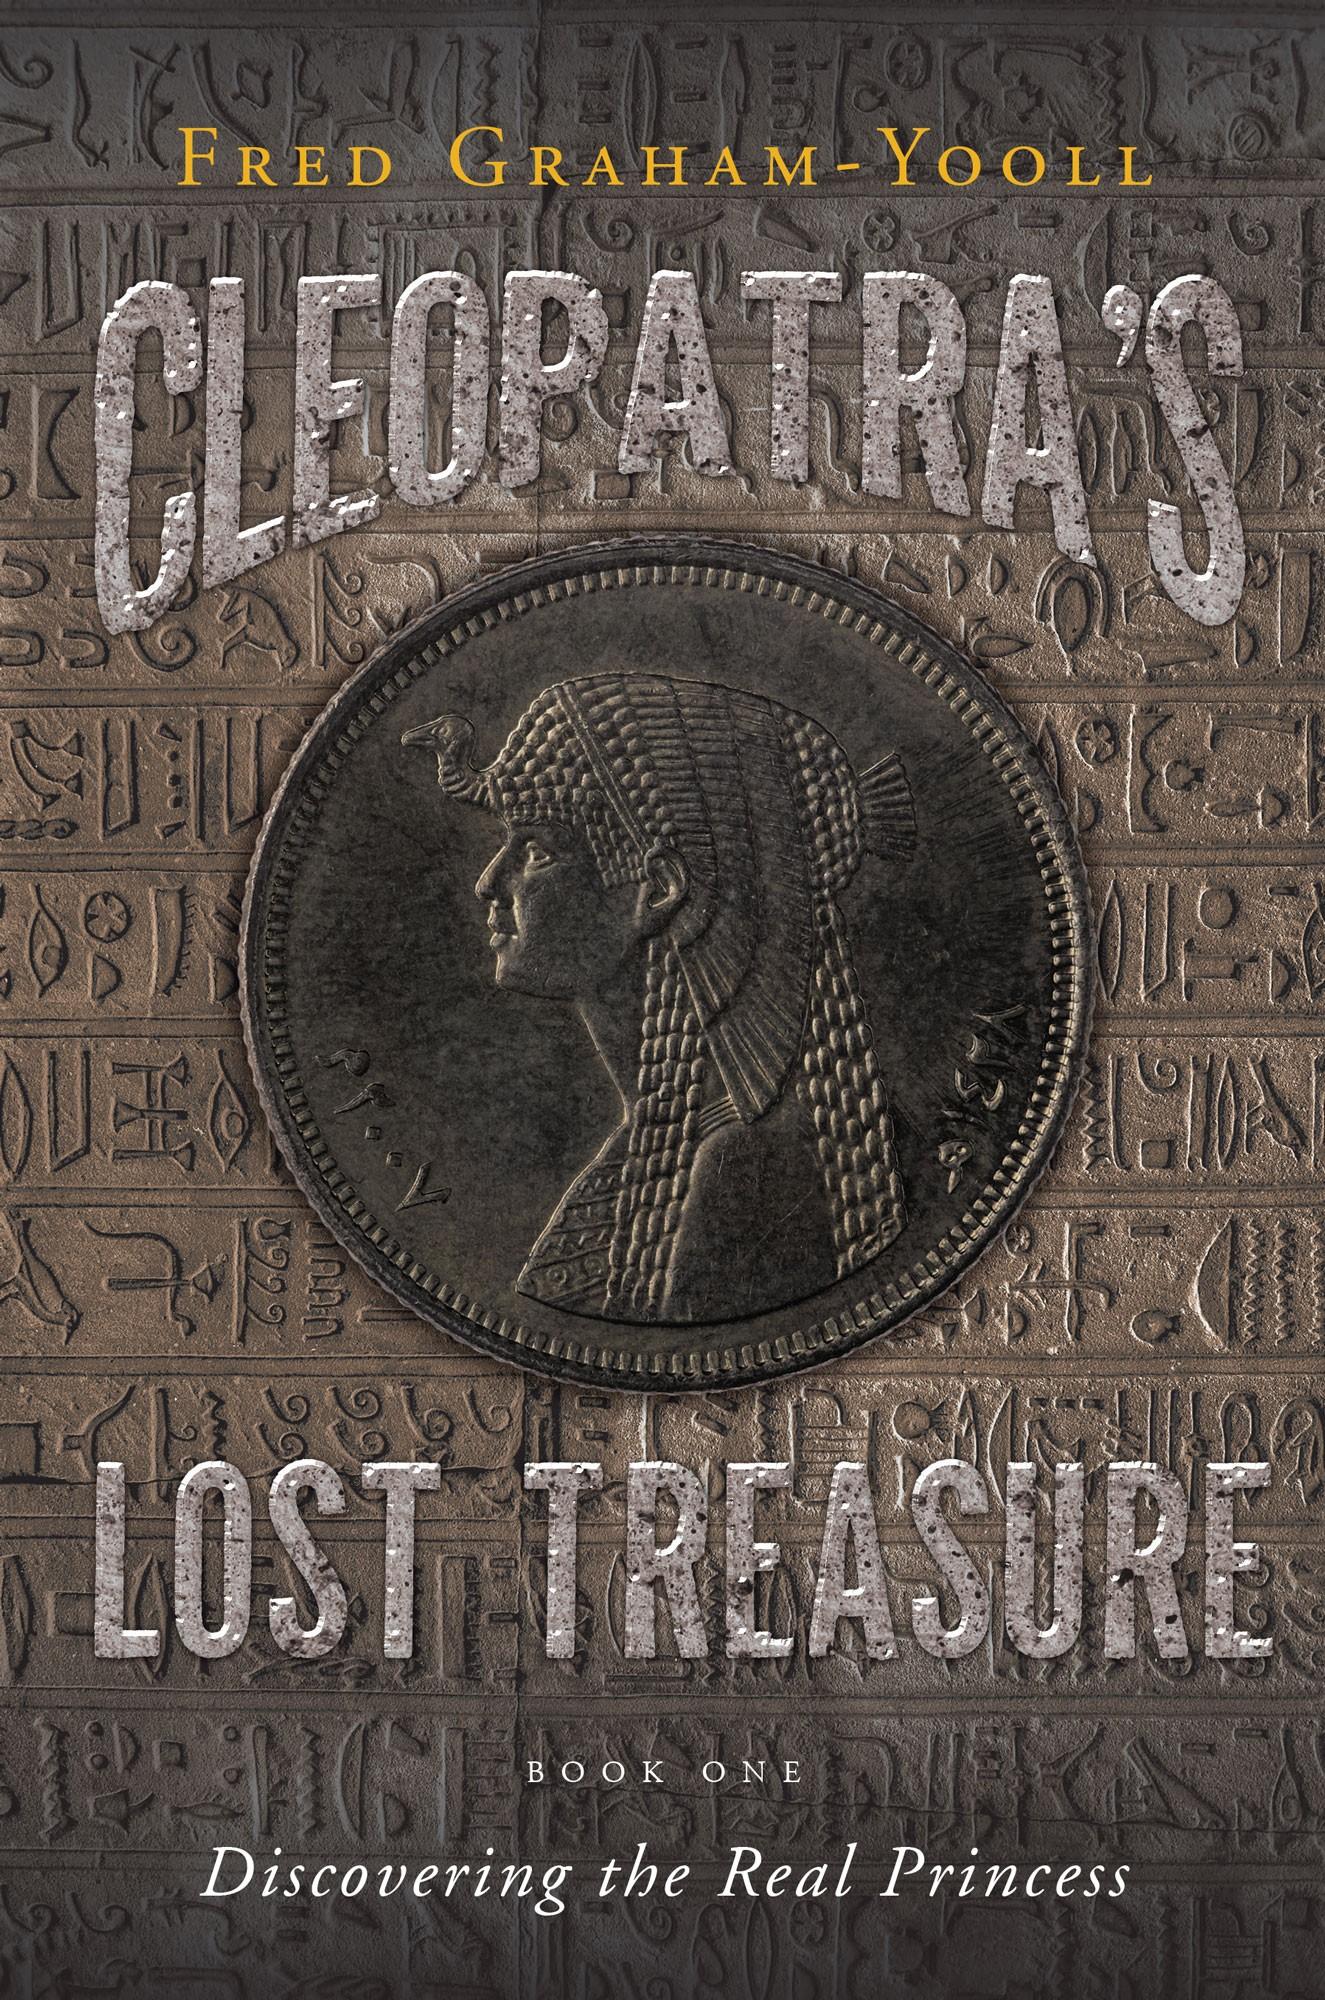 Fred Graham-Yooll – Cleopatra's Lost Treassure